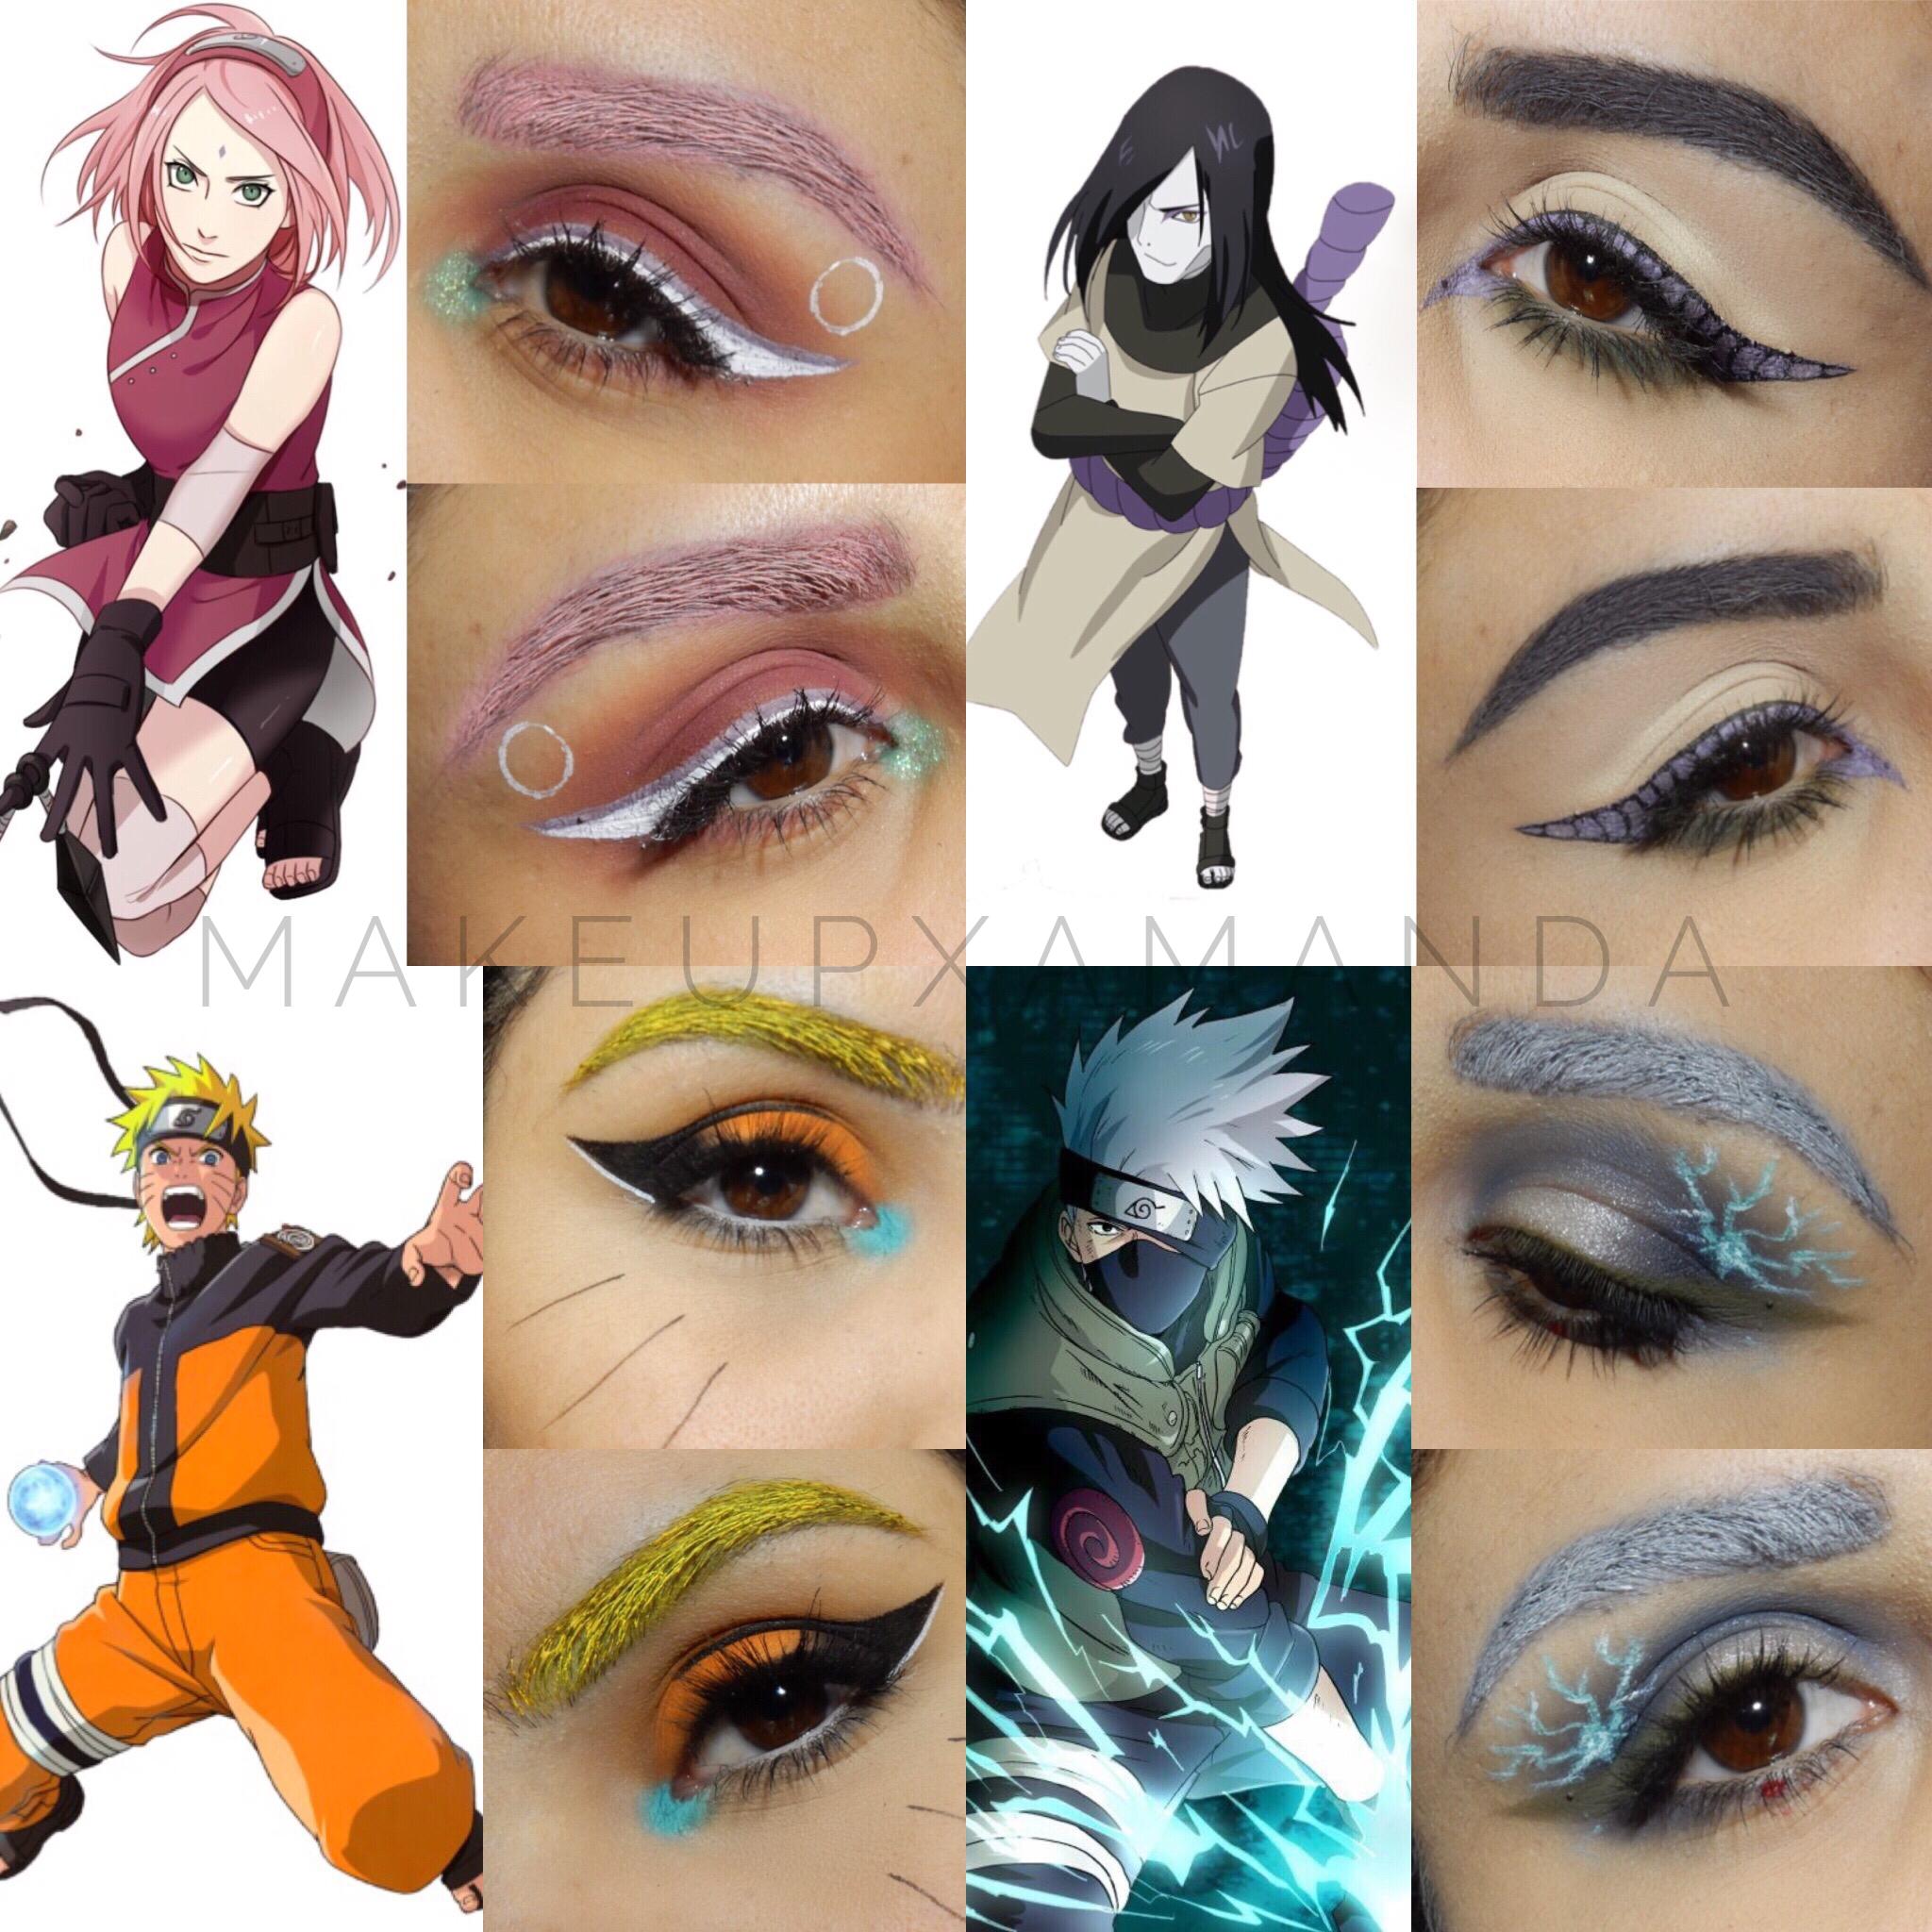 The Best Naruto Makeup Look And Pics In 2020 Anime Makeup Makeup Anime Cosplay Makeup